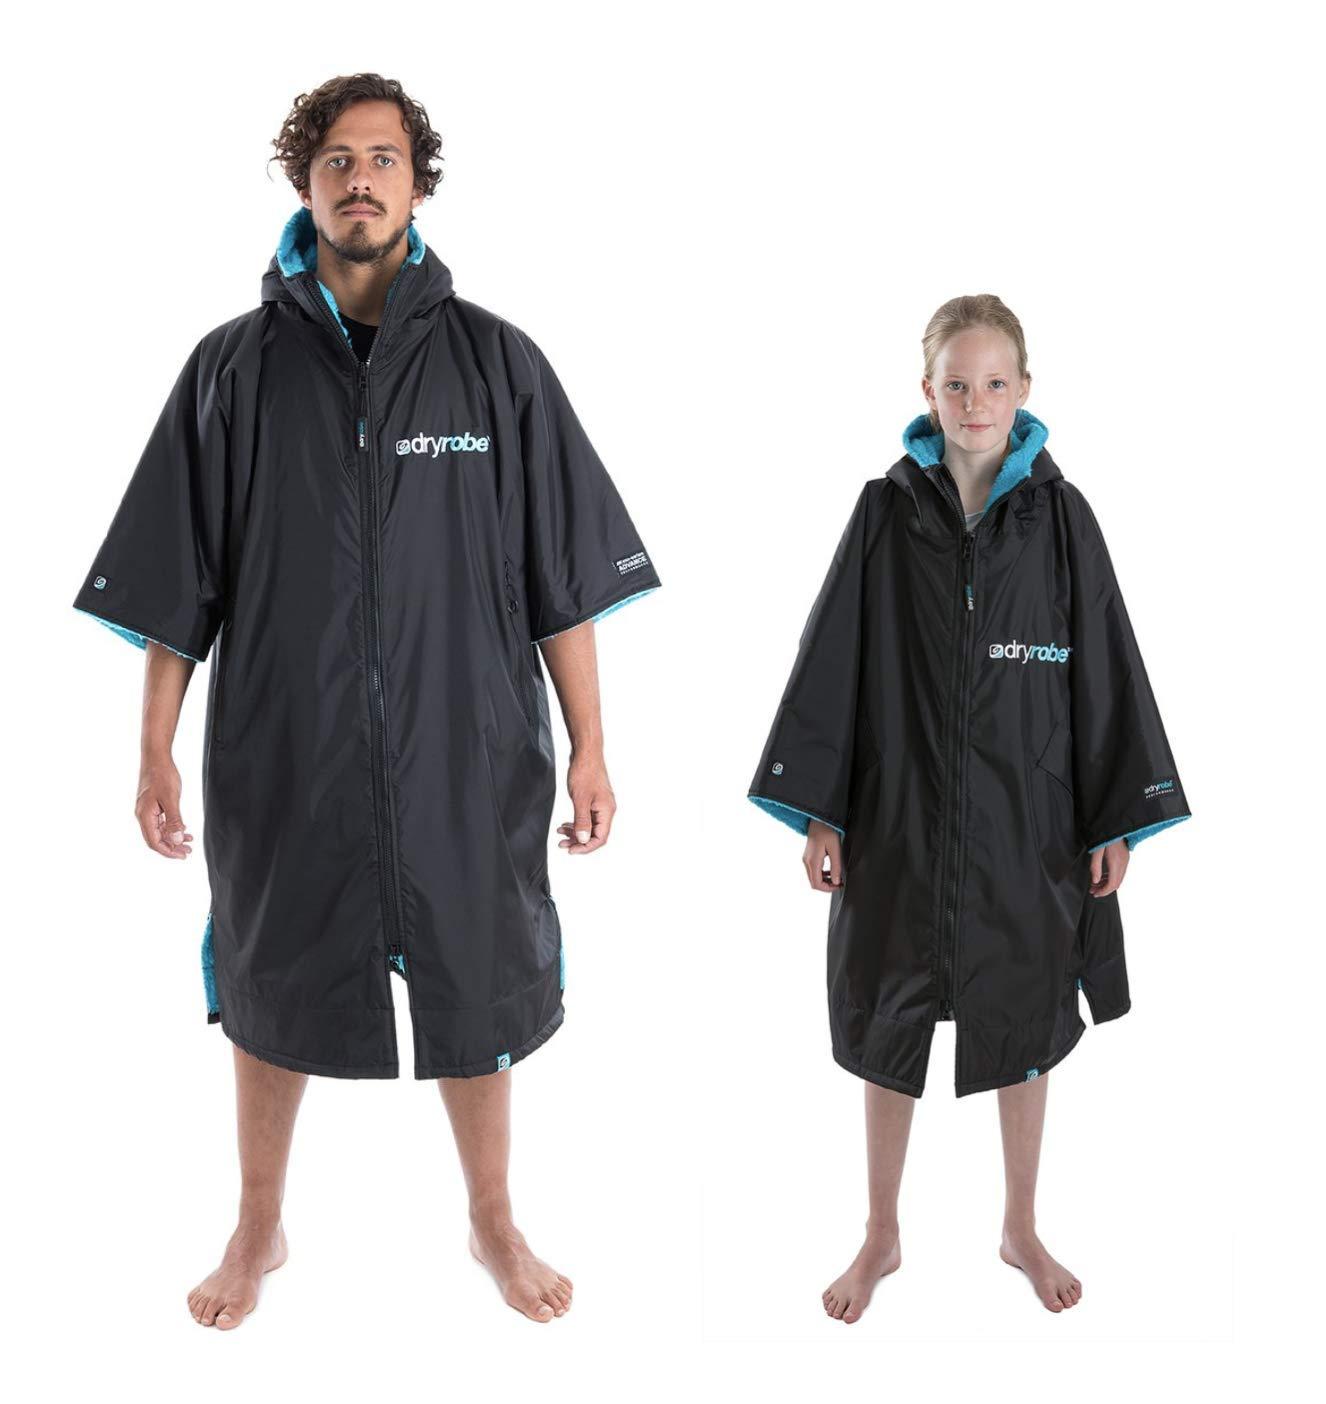 Dryrobe Advance Short Sleeve Change Robe - Stay Warm and Dry - Waterproof Oversized Swim Parka